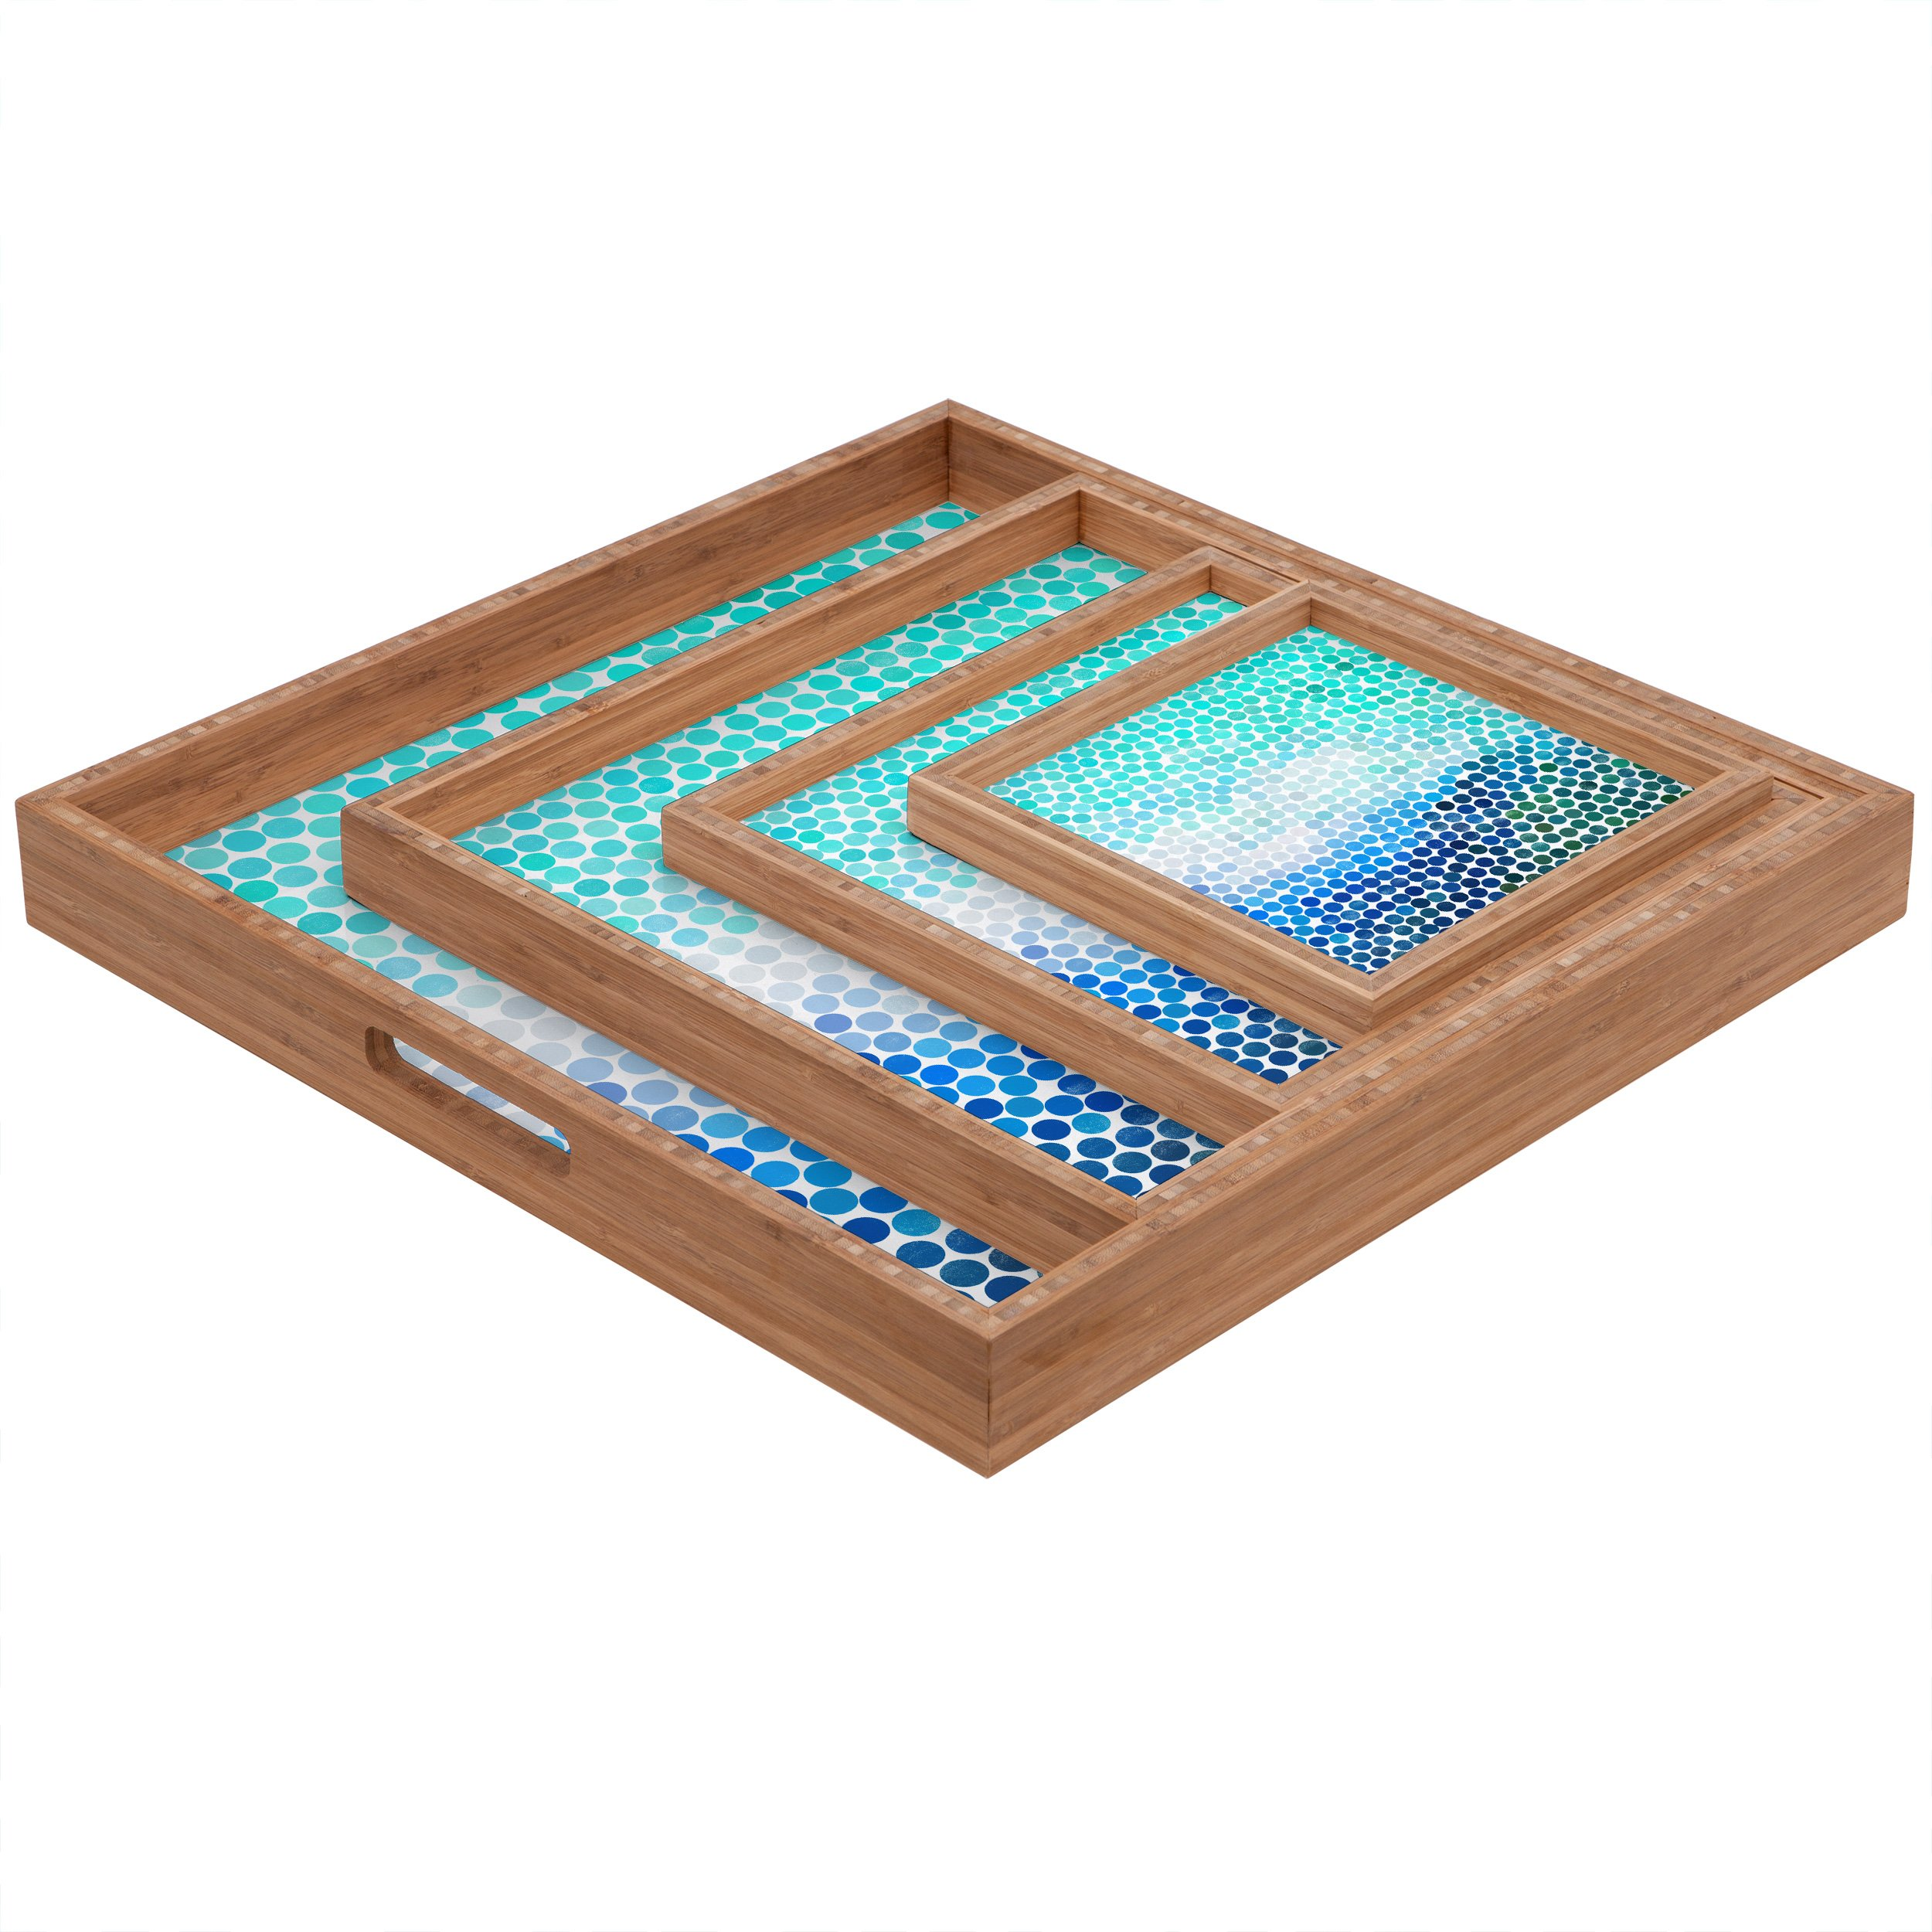 Deny Designs Garima Dhawan Unfolding 2 Indoor//Outdoor Rectangular Tray Large//14 x 18